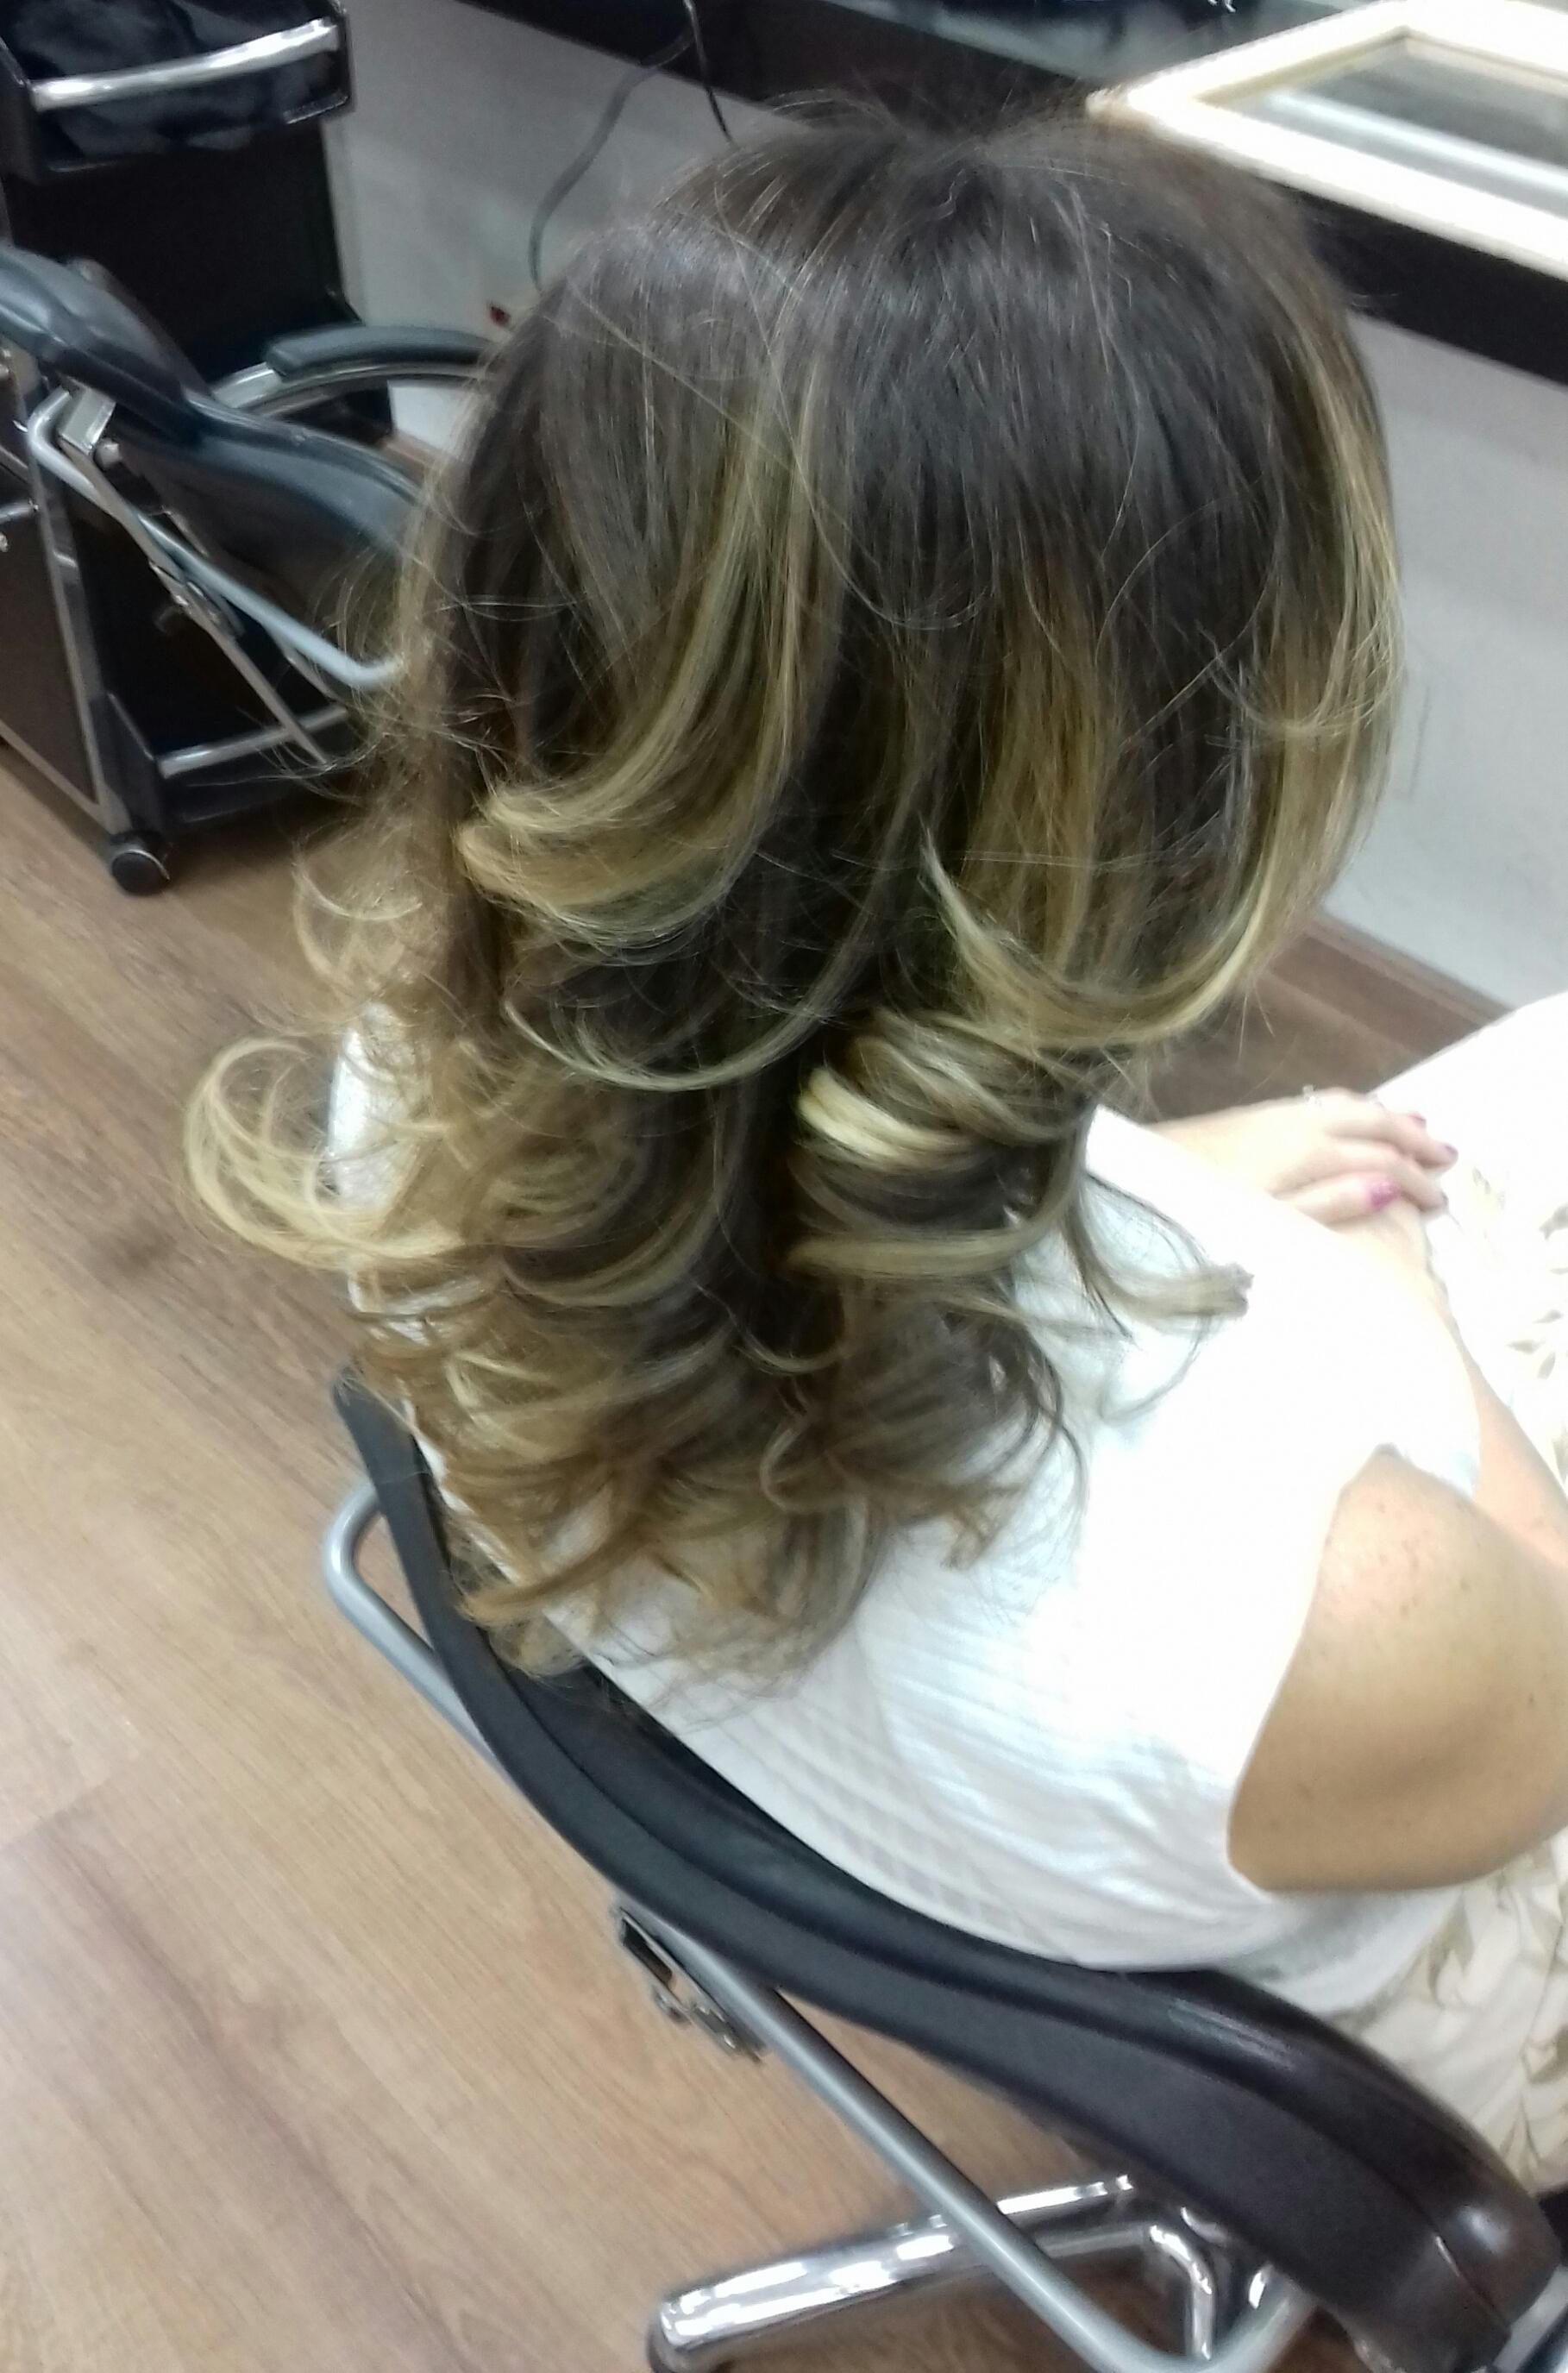 cabelo cabeleireiro(a) maquiador(a) depilador(a) gerente consultor(a)